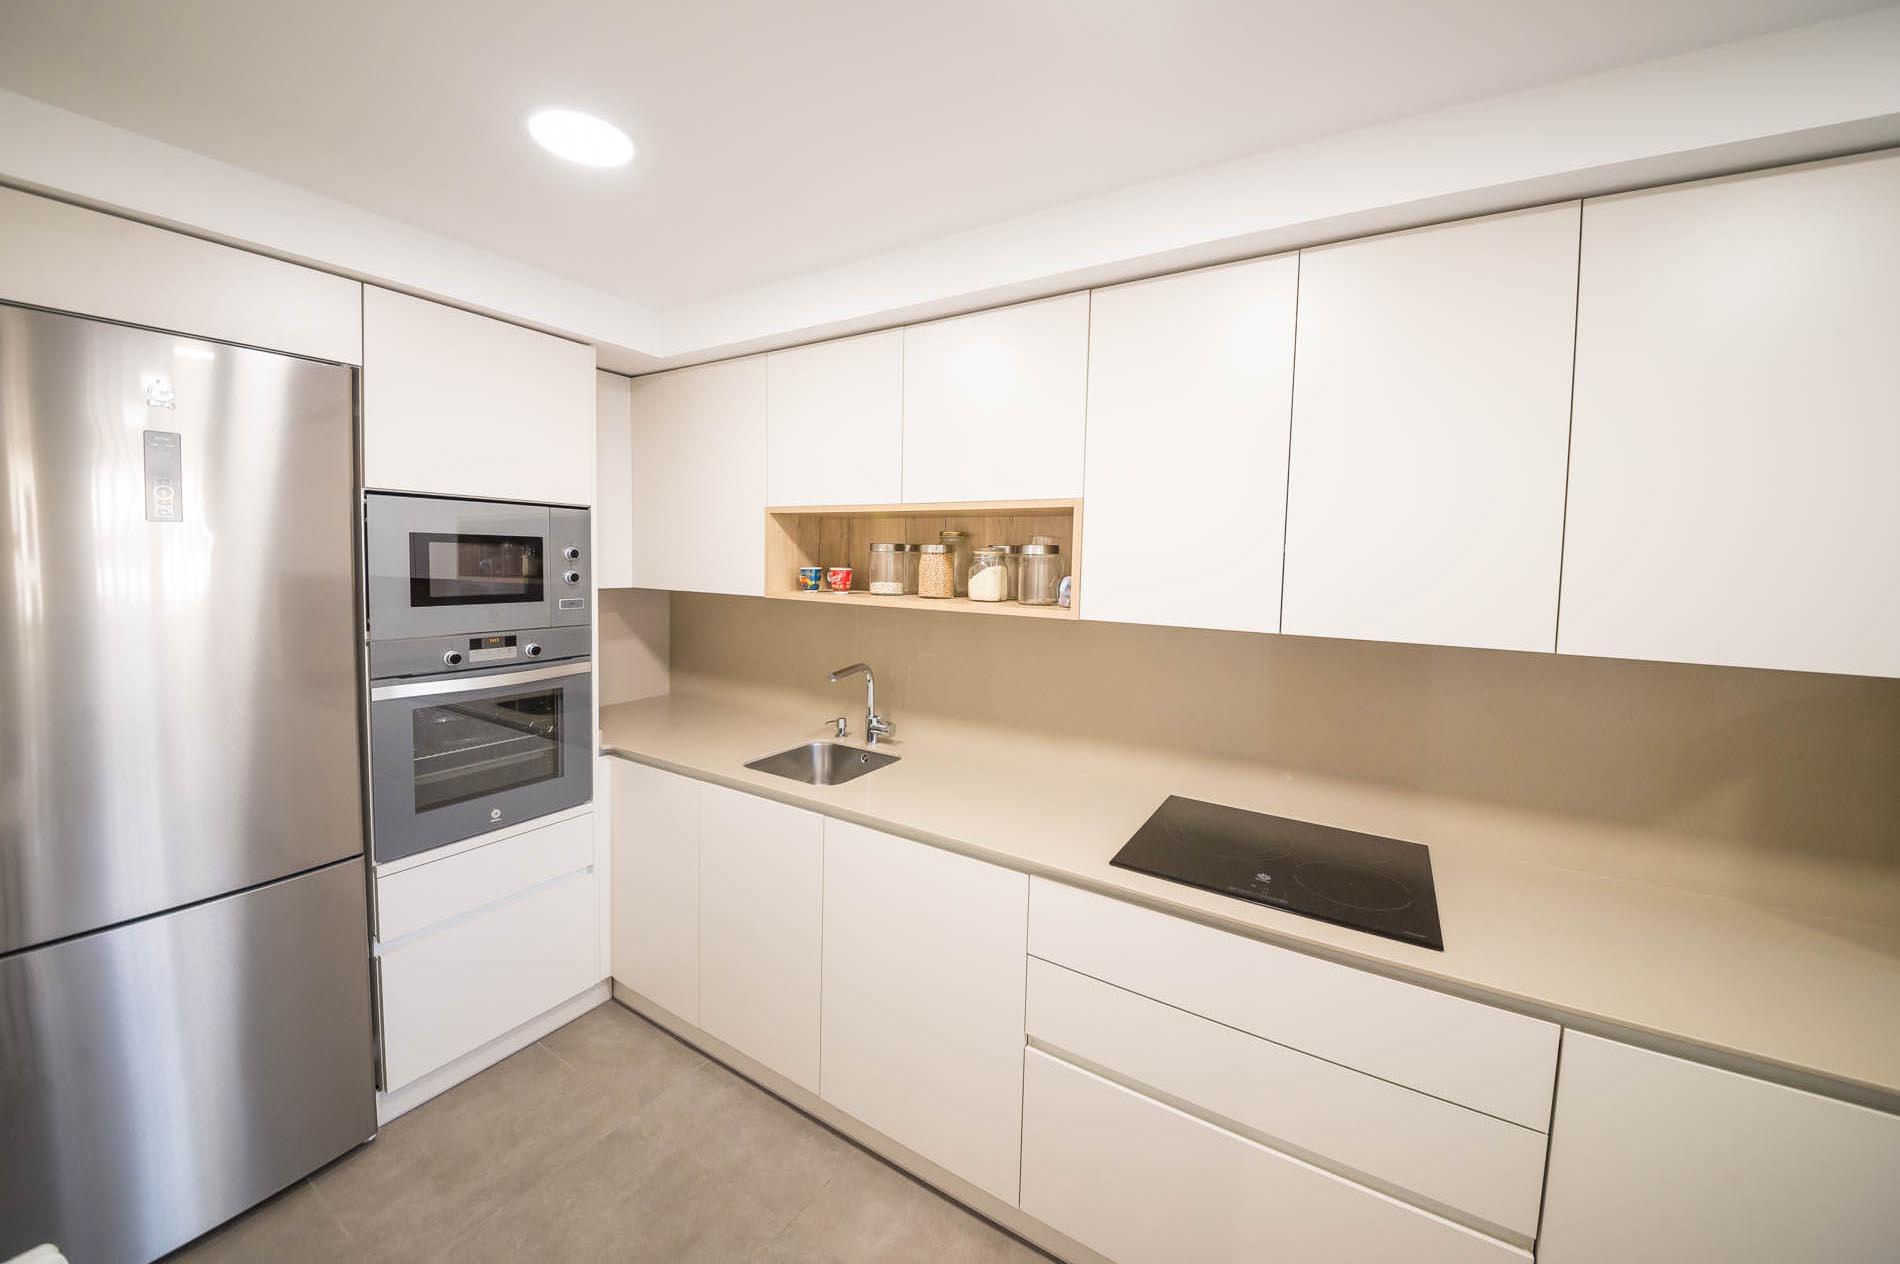 reforma integral de piso en zaragoza - cotazeta - arquitectura en Zaragoza